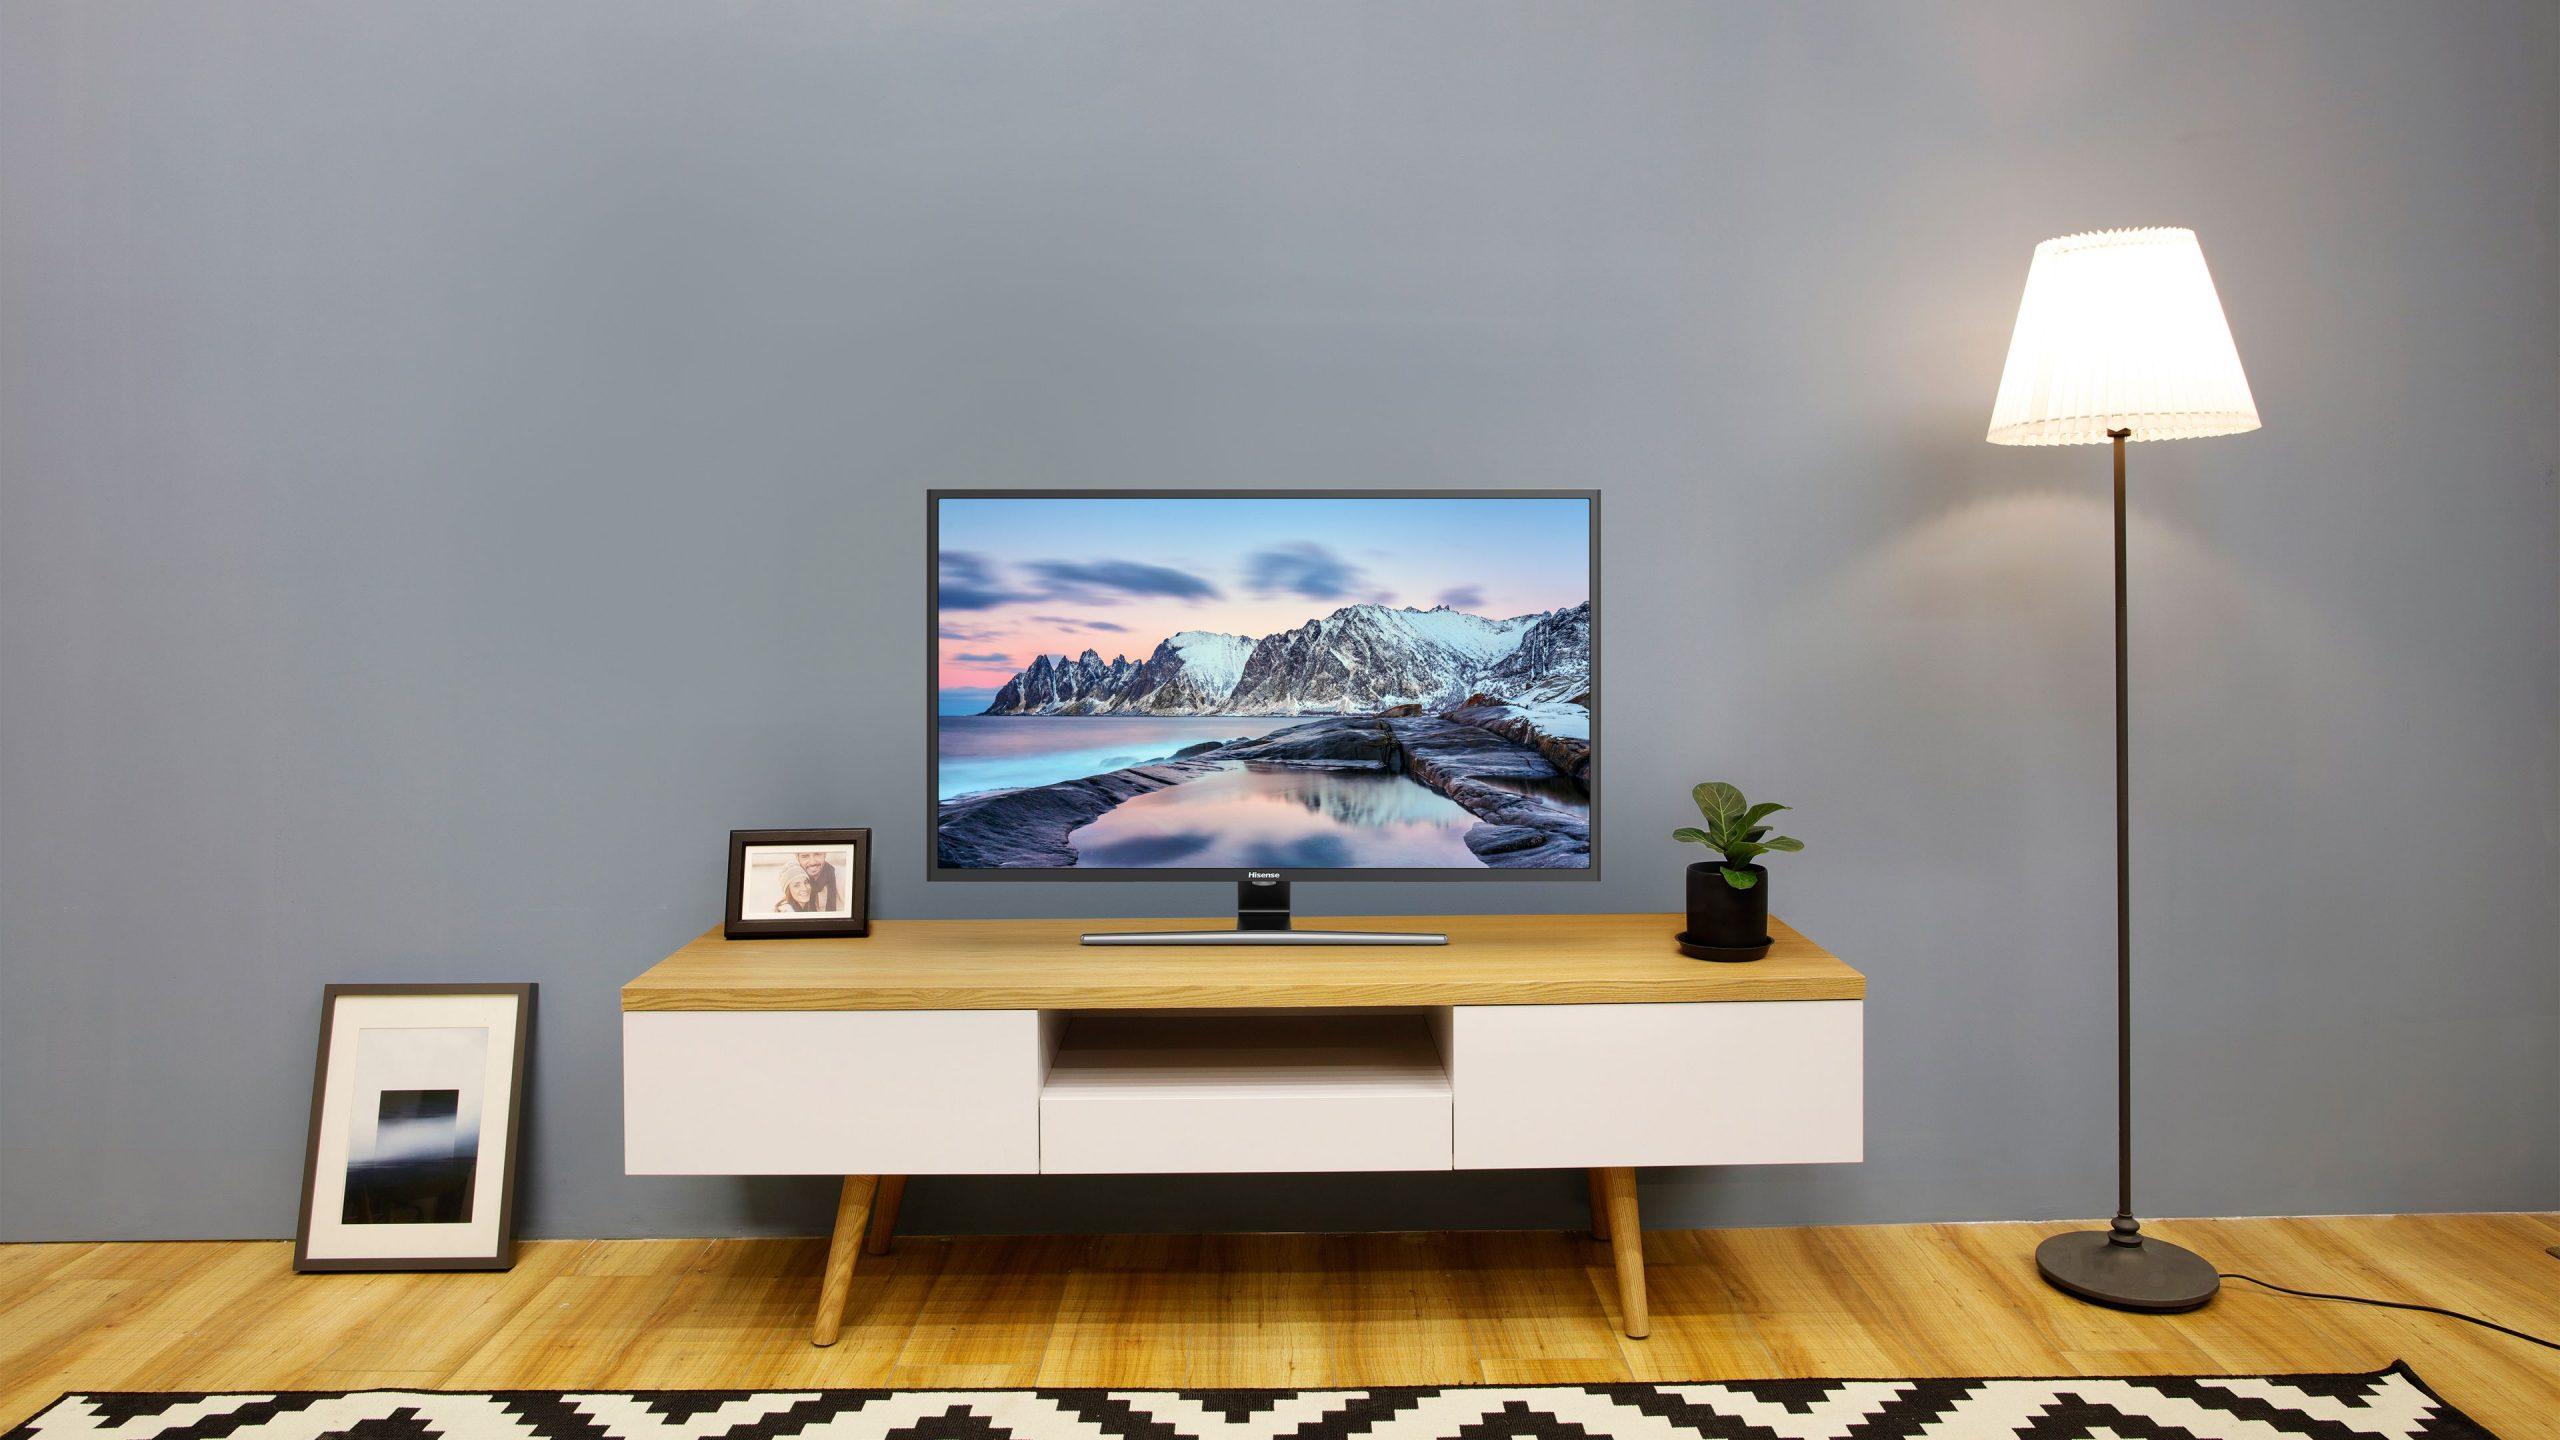 Volano le vendite dei TV Hisense nei primi 6 mesi del 2020 thumbnail